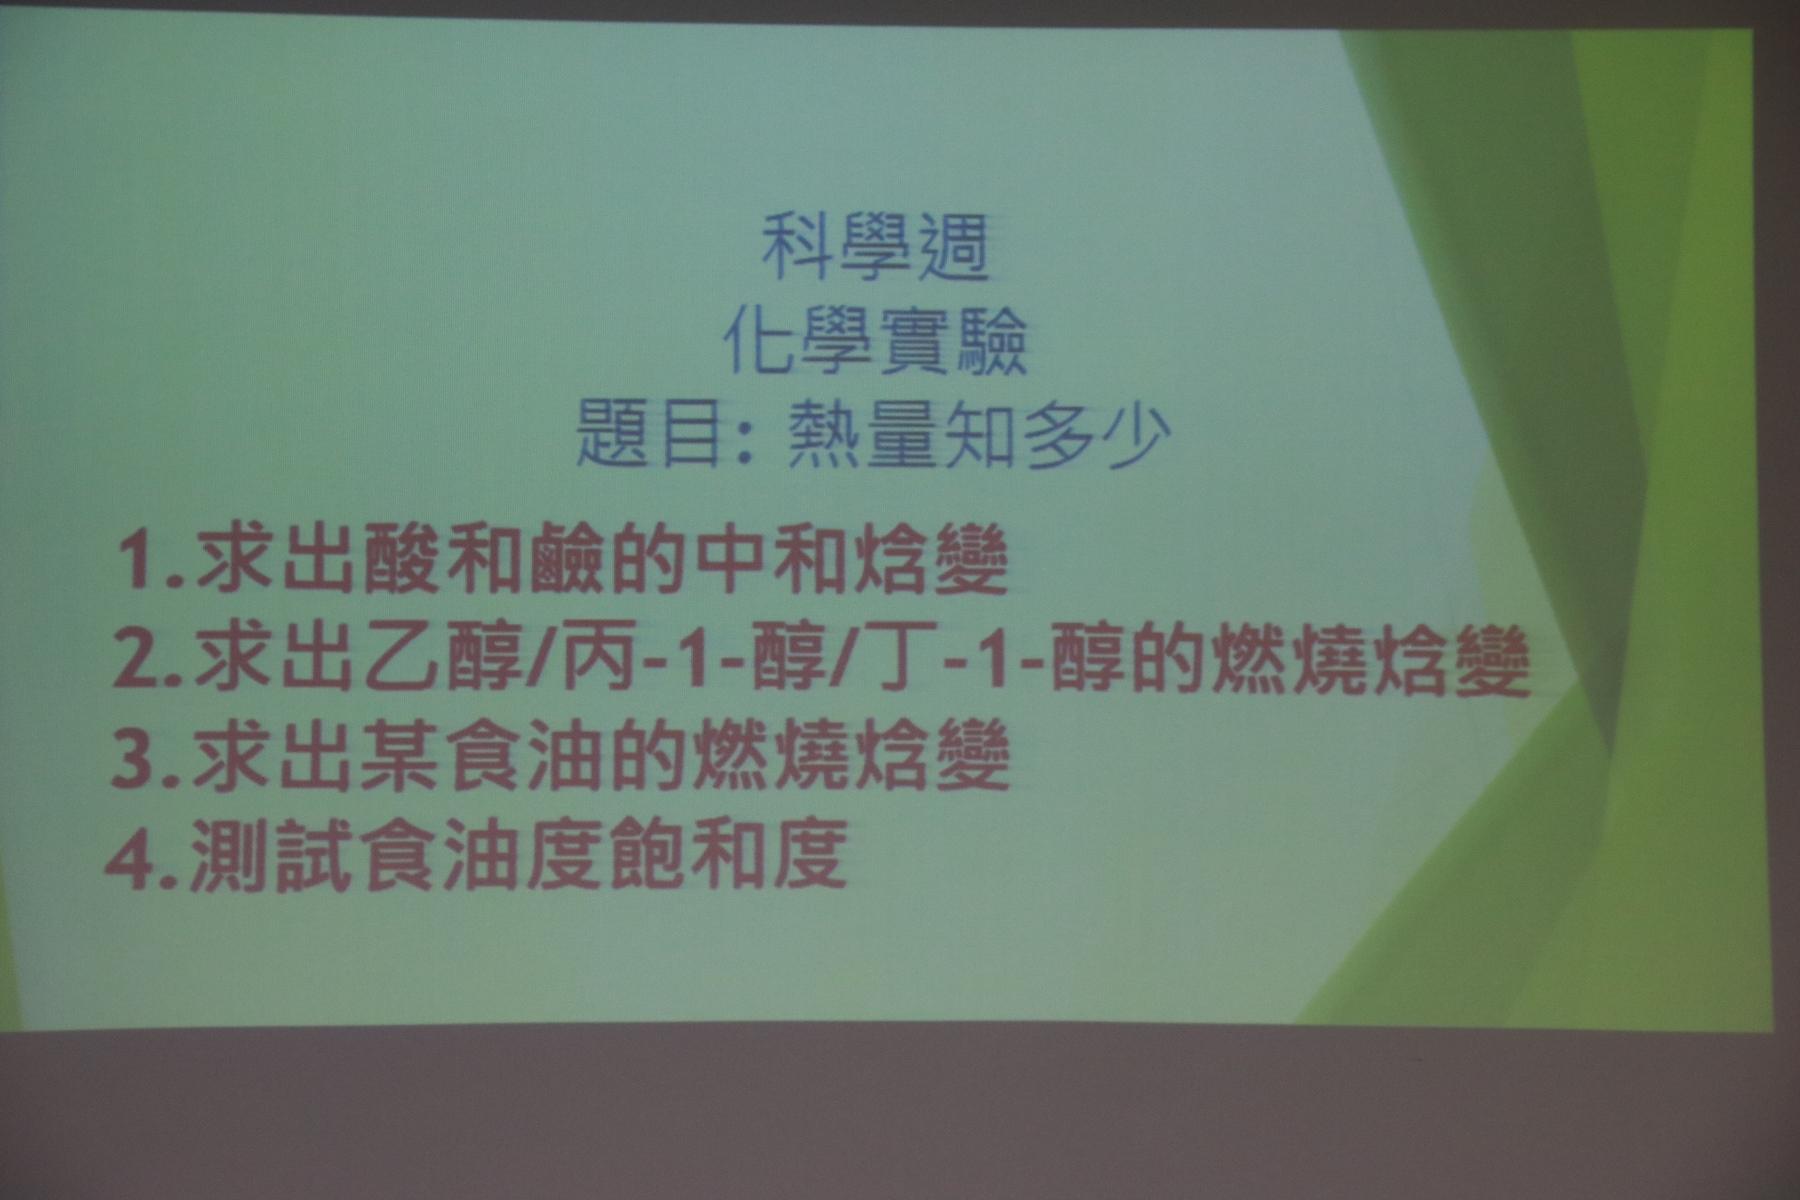 http://www.npc.edu.hk/sites/default/files/img_7456.jpg